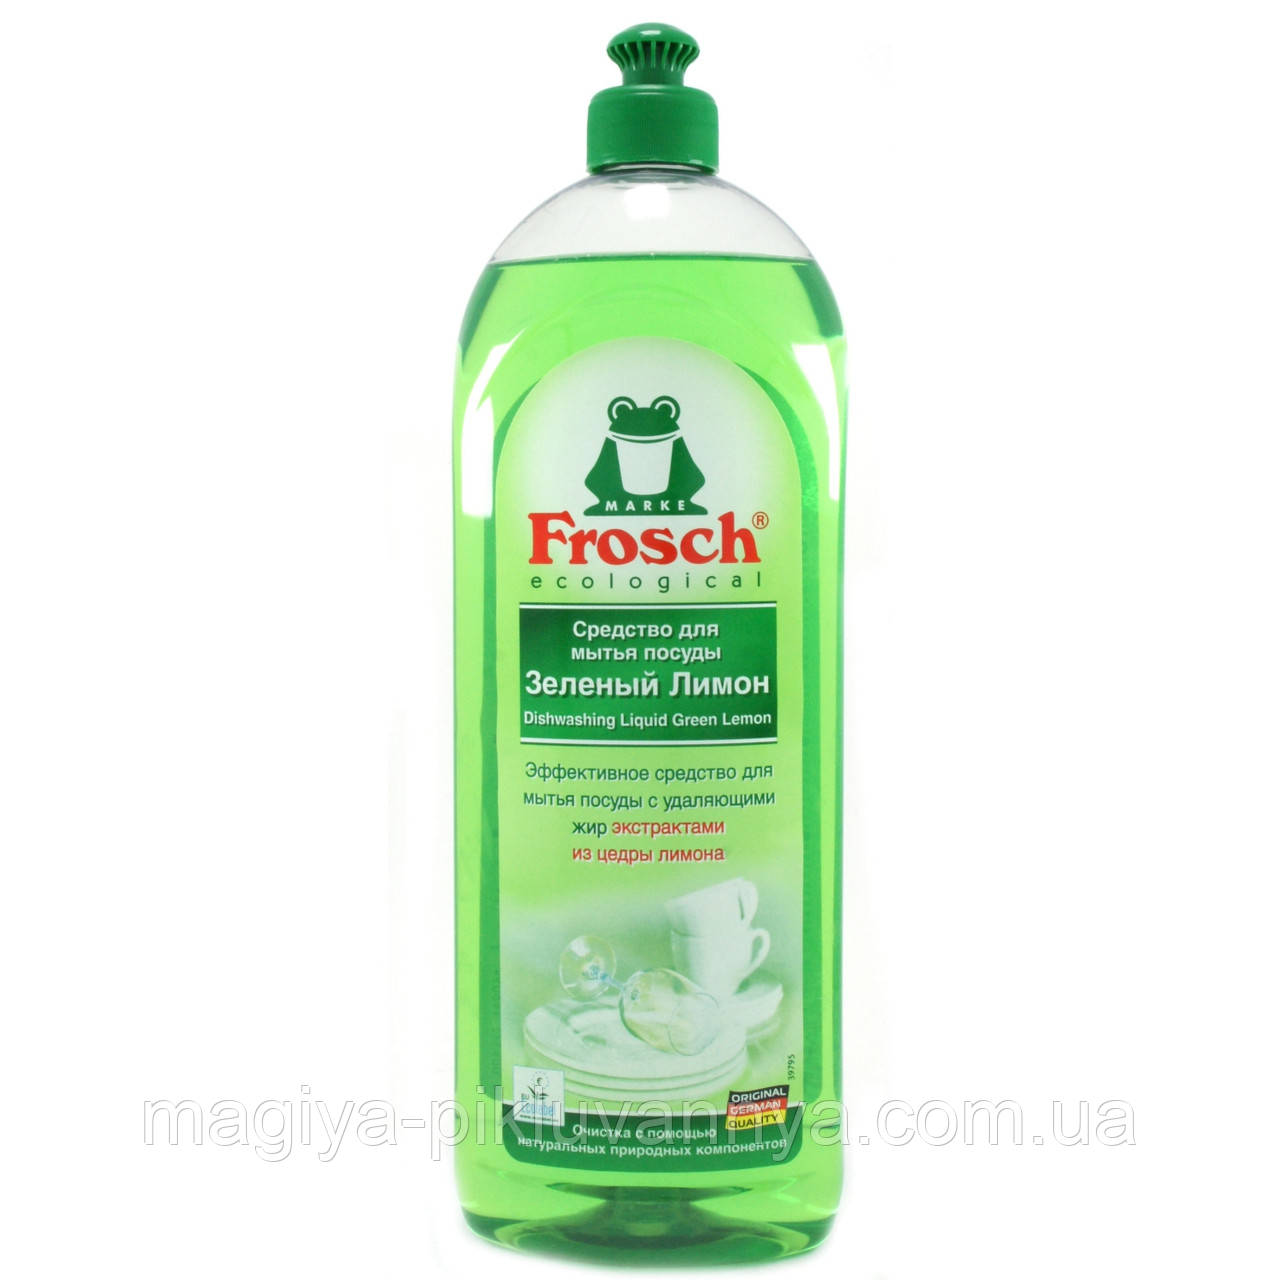 Средство для мытья посуды Frosch Зеленый Лимон 1 л, арт.148094